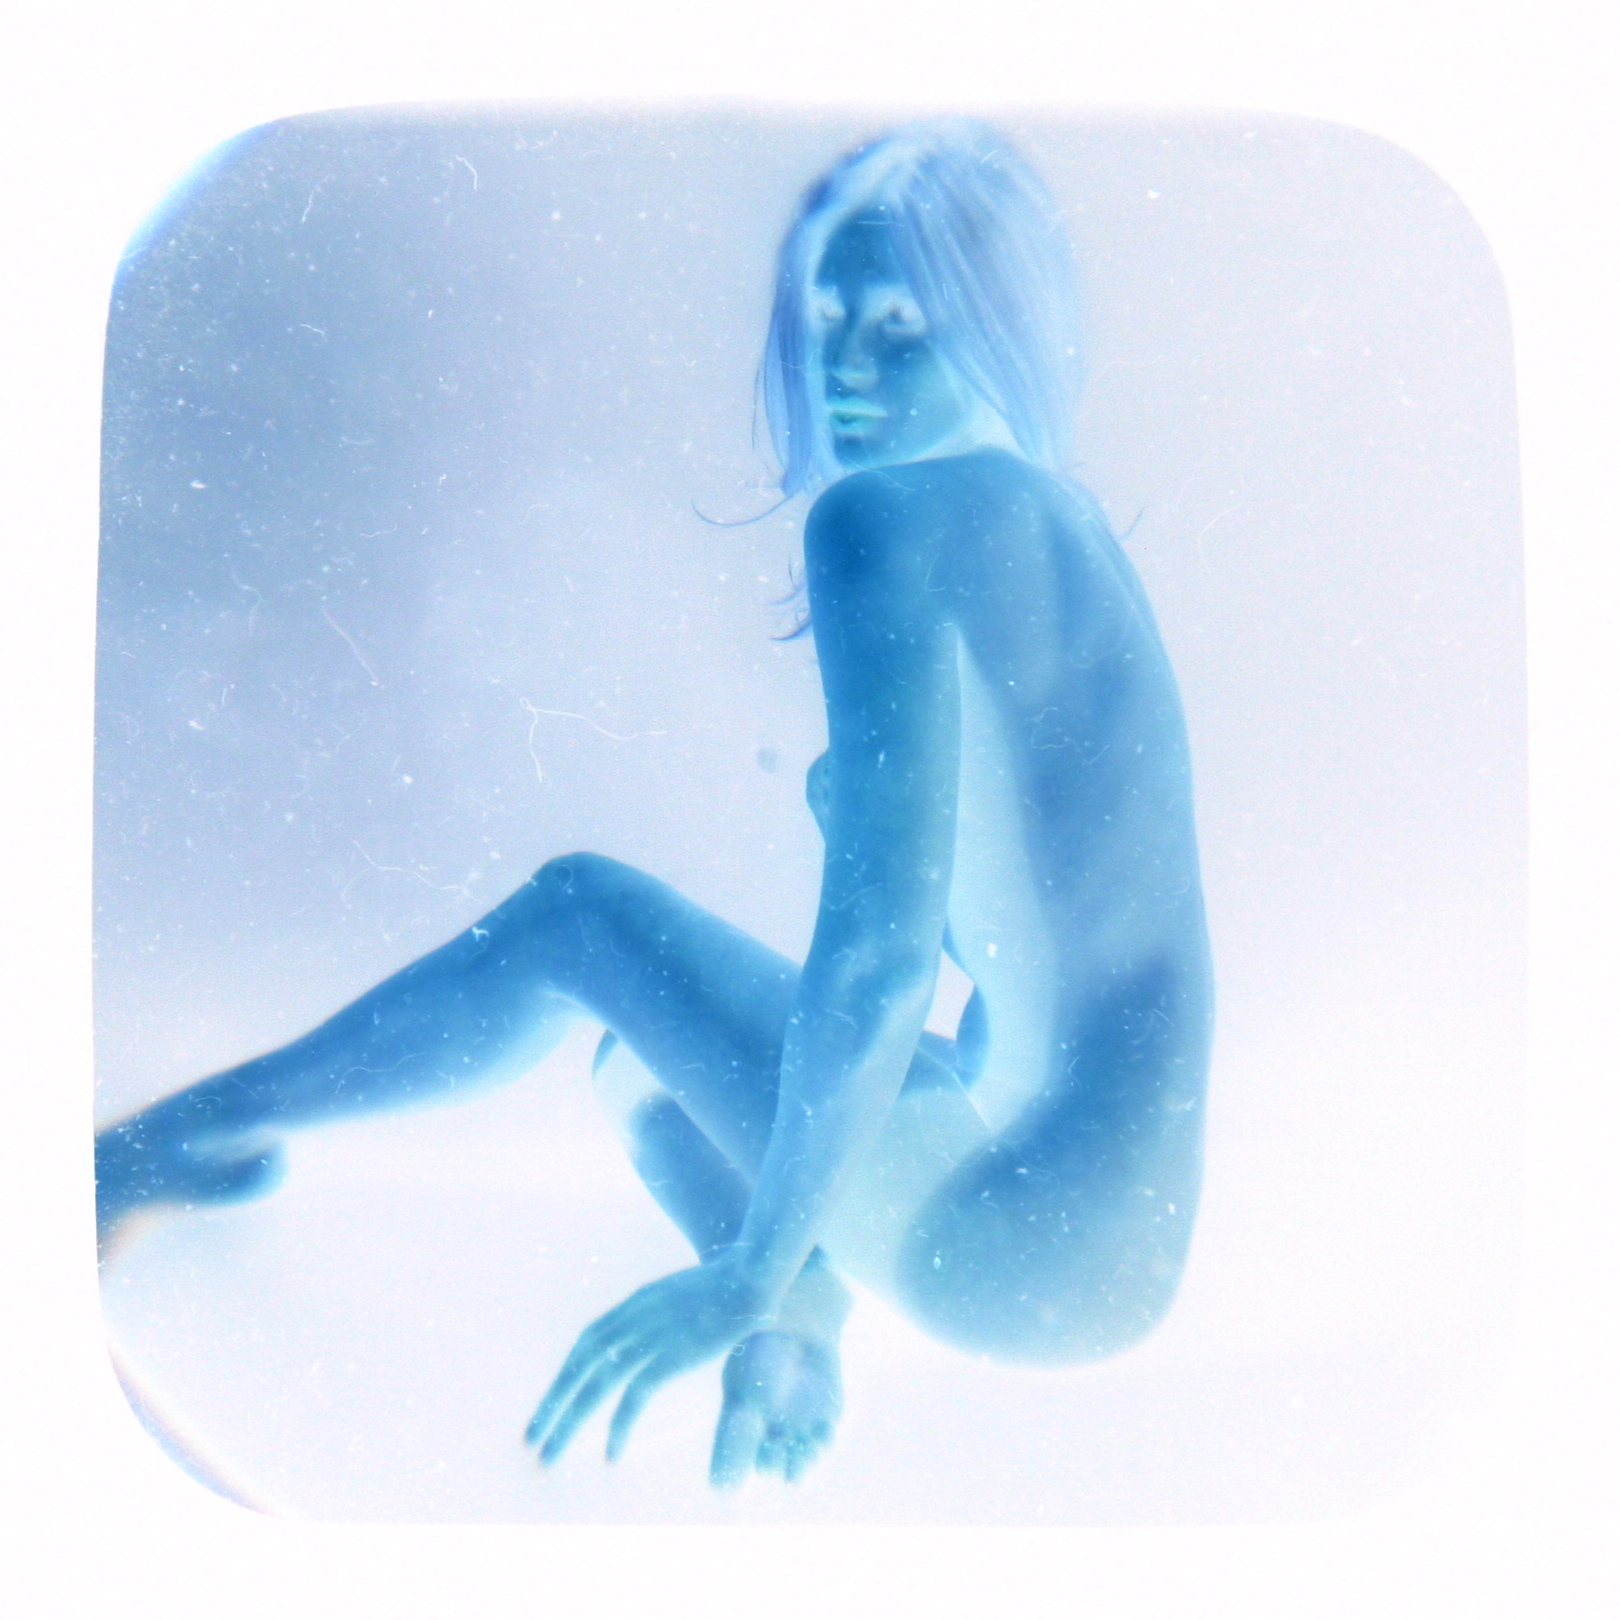 BLUE PRINT 3.jpg